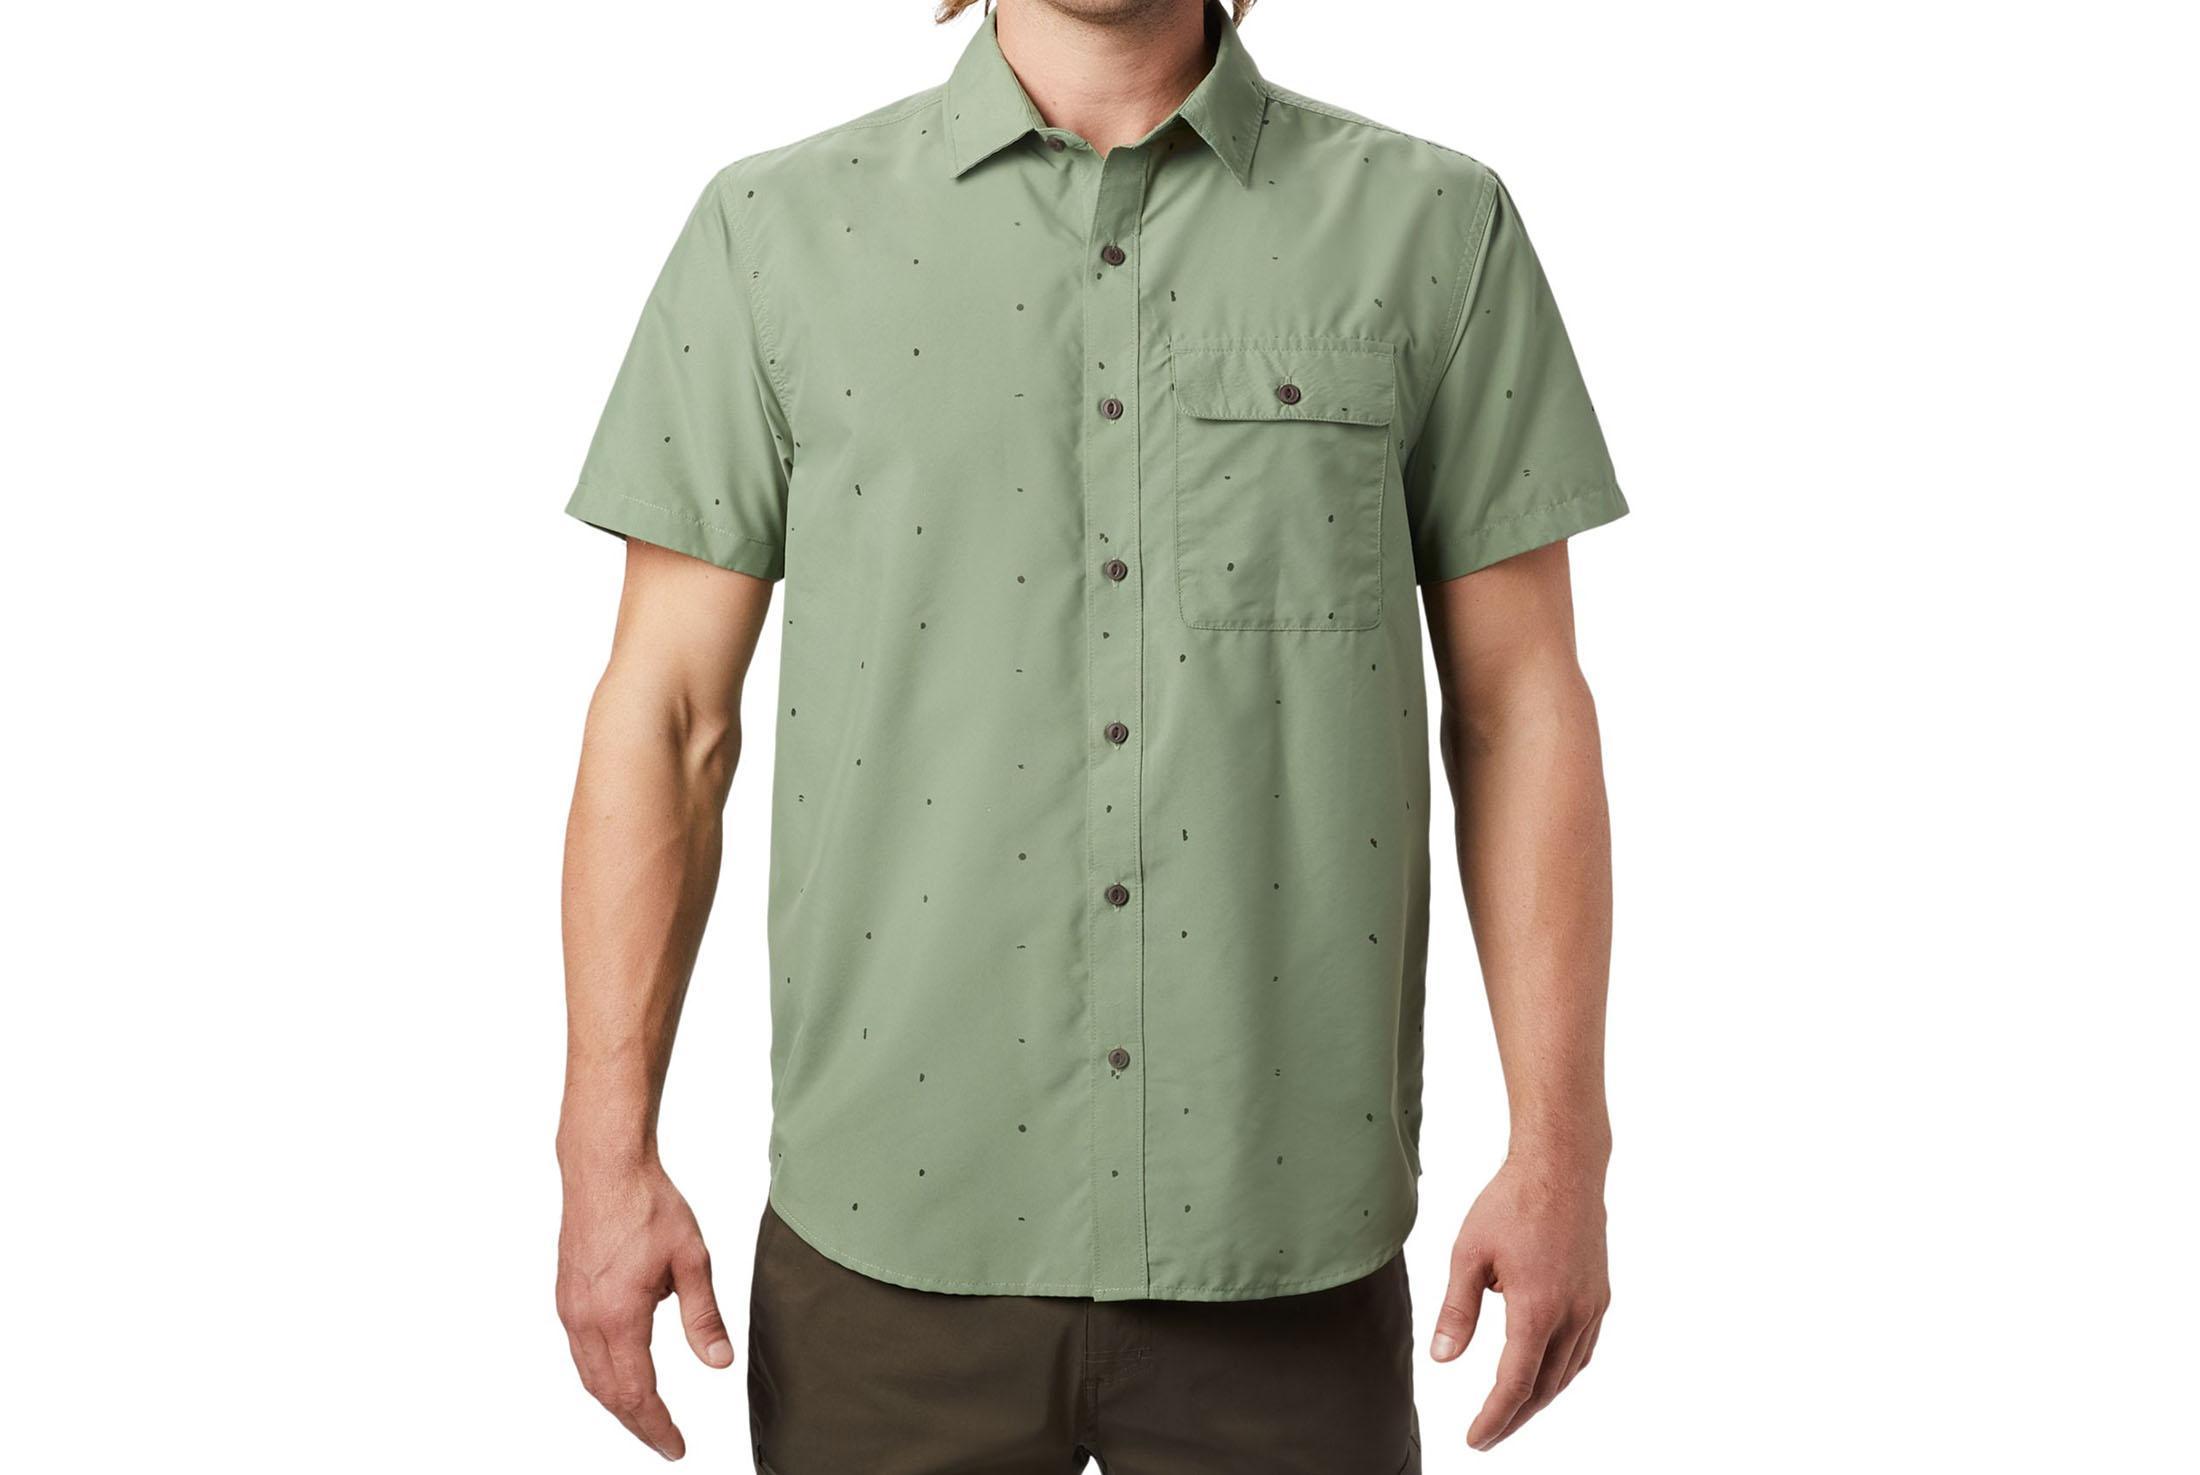 Mountain Hardwear Greenstone Short Sleeve Shirt